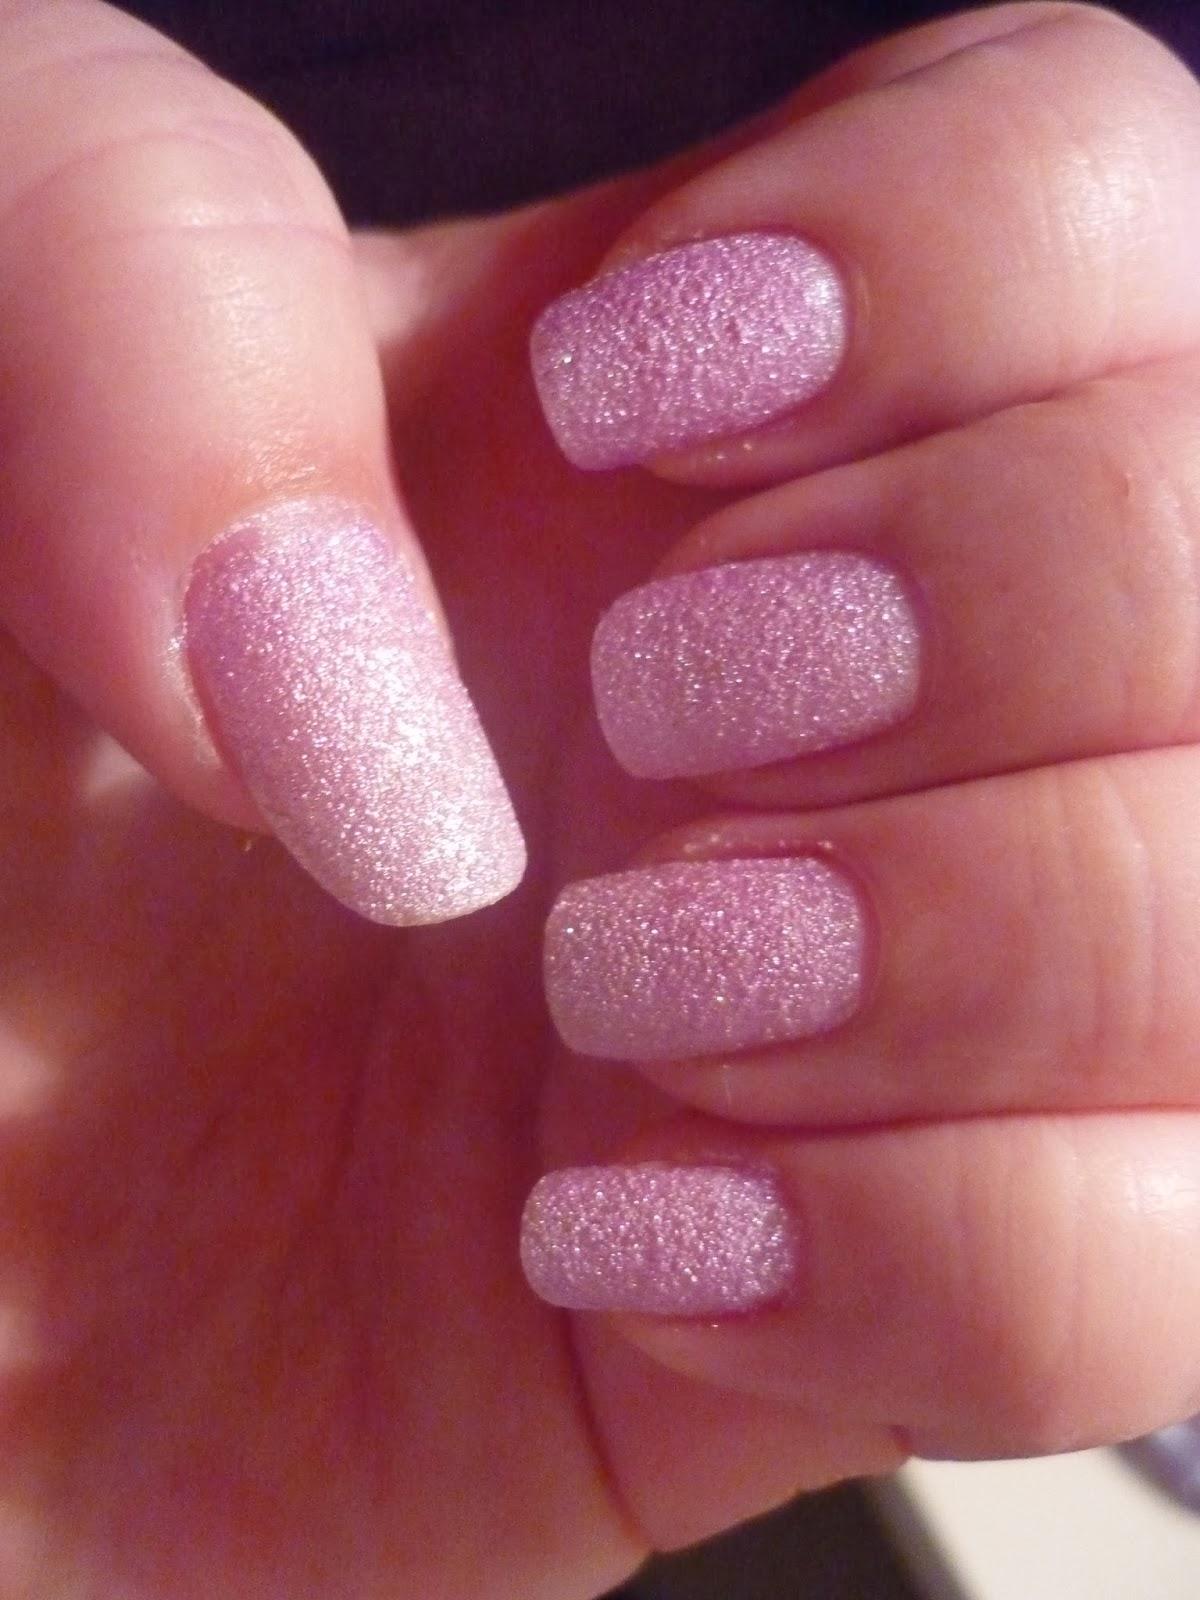 Lsg Blog Recenze Trpytivy Lak Na Nehty Stars Od Gabriella Salvete Odstin 13 Lavender Love